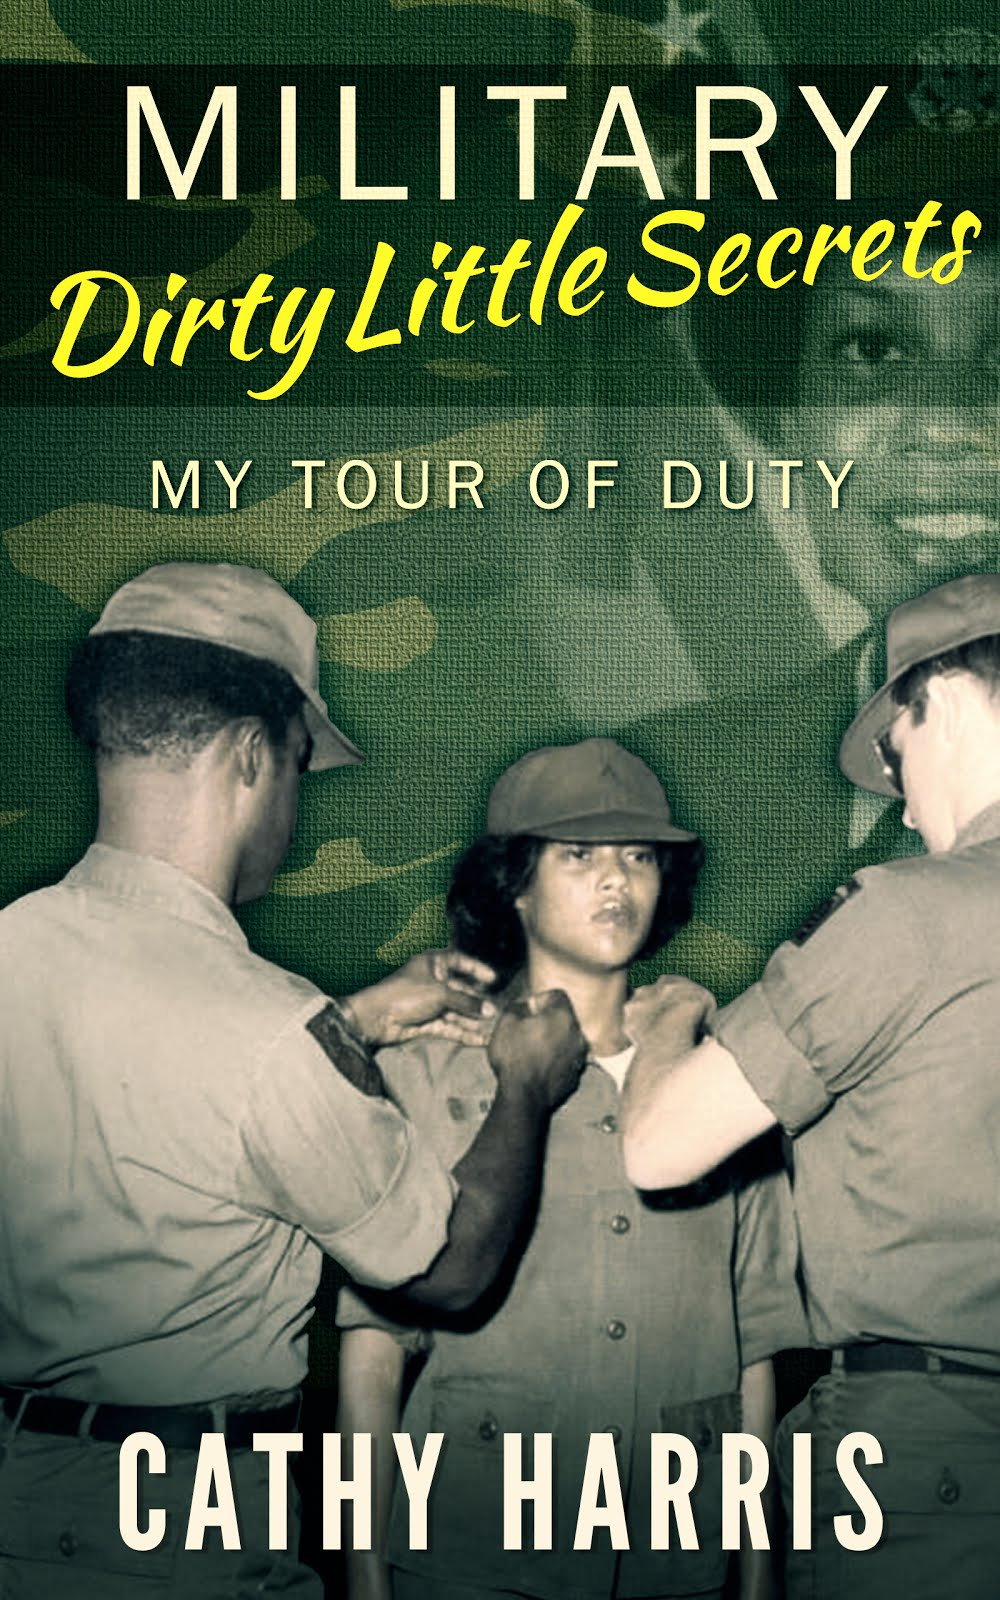 Military Dirty Little Secrets